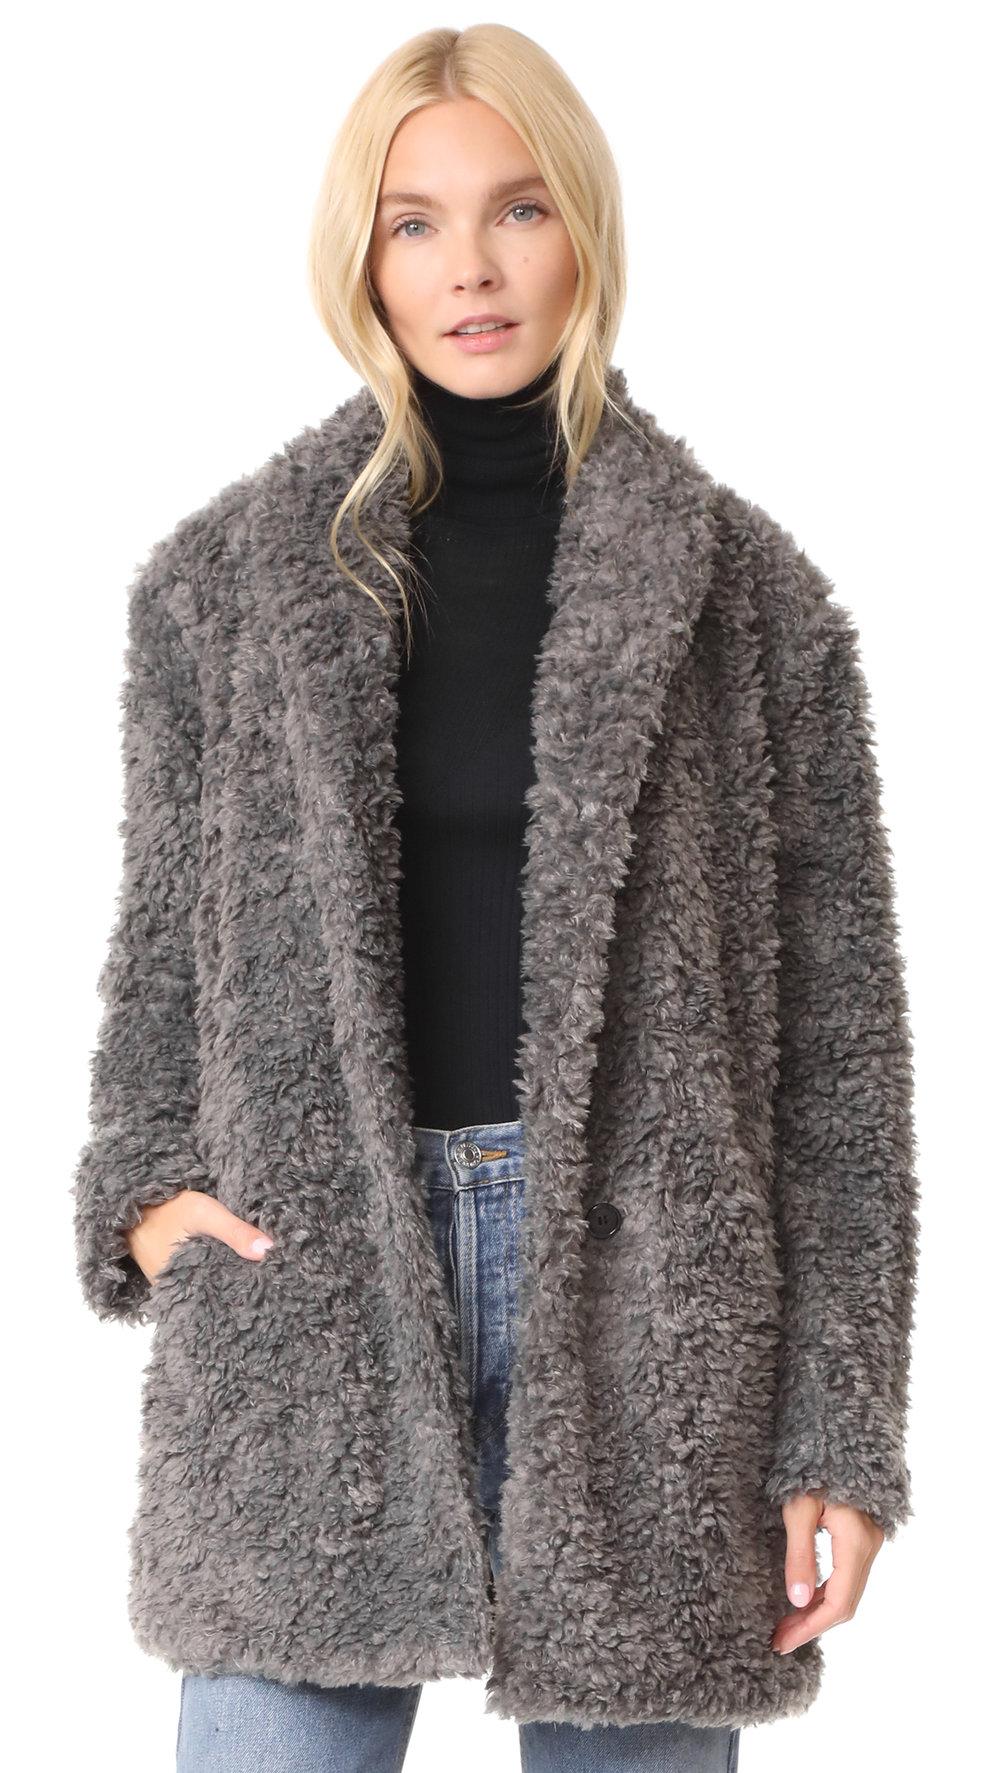 Joie katasavia coat